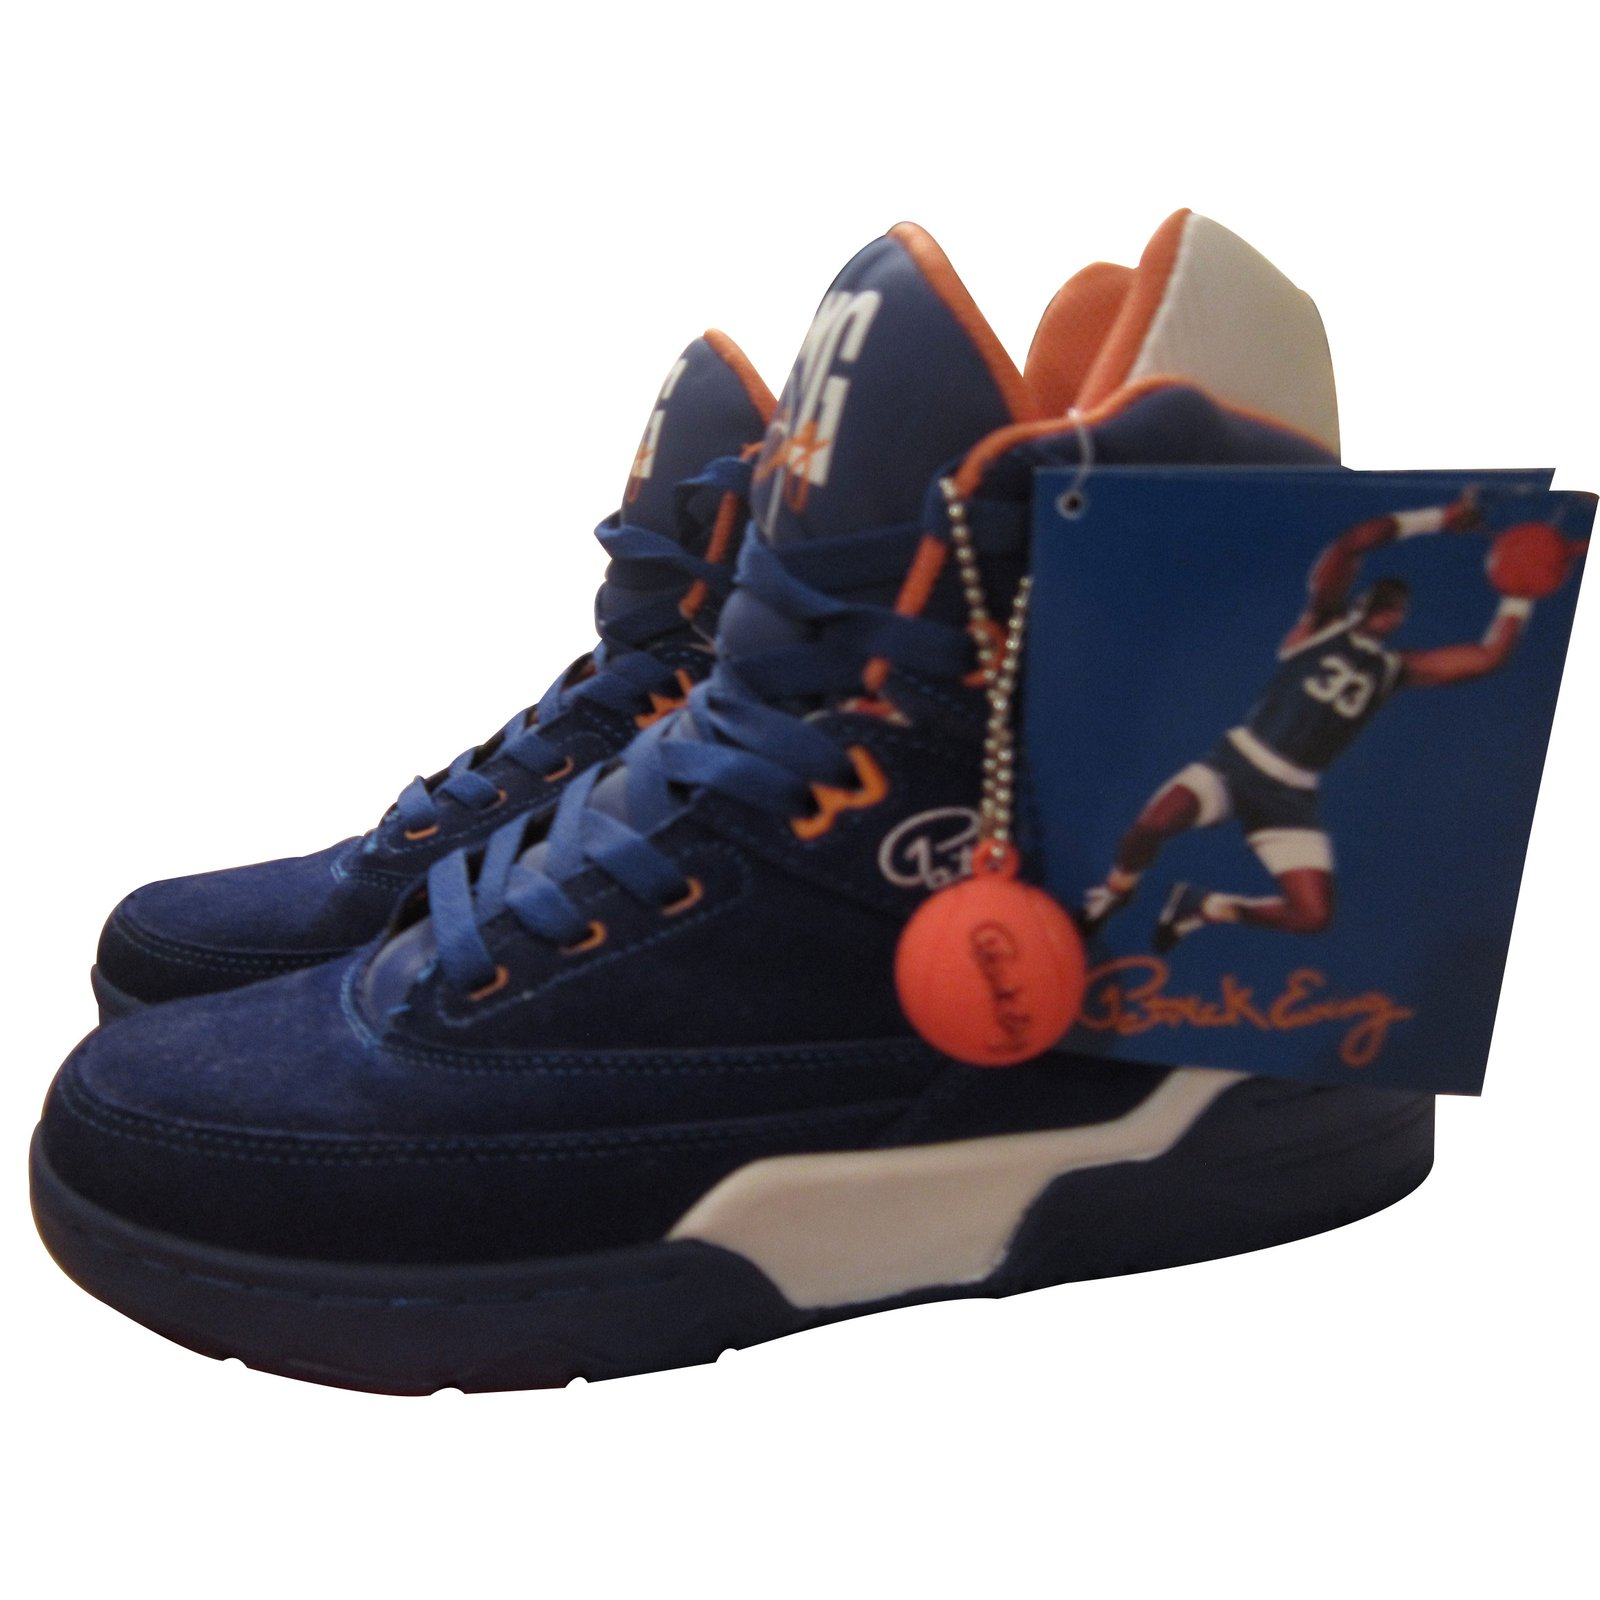 Patrick Ewing Sneakers Sneakers